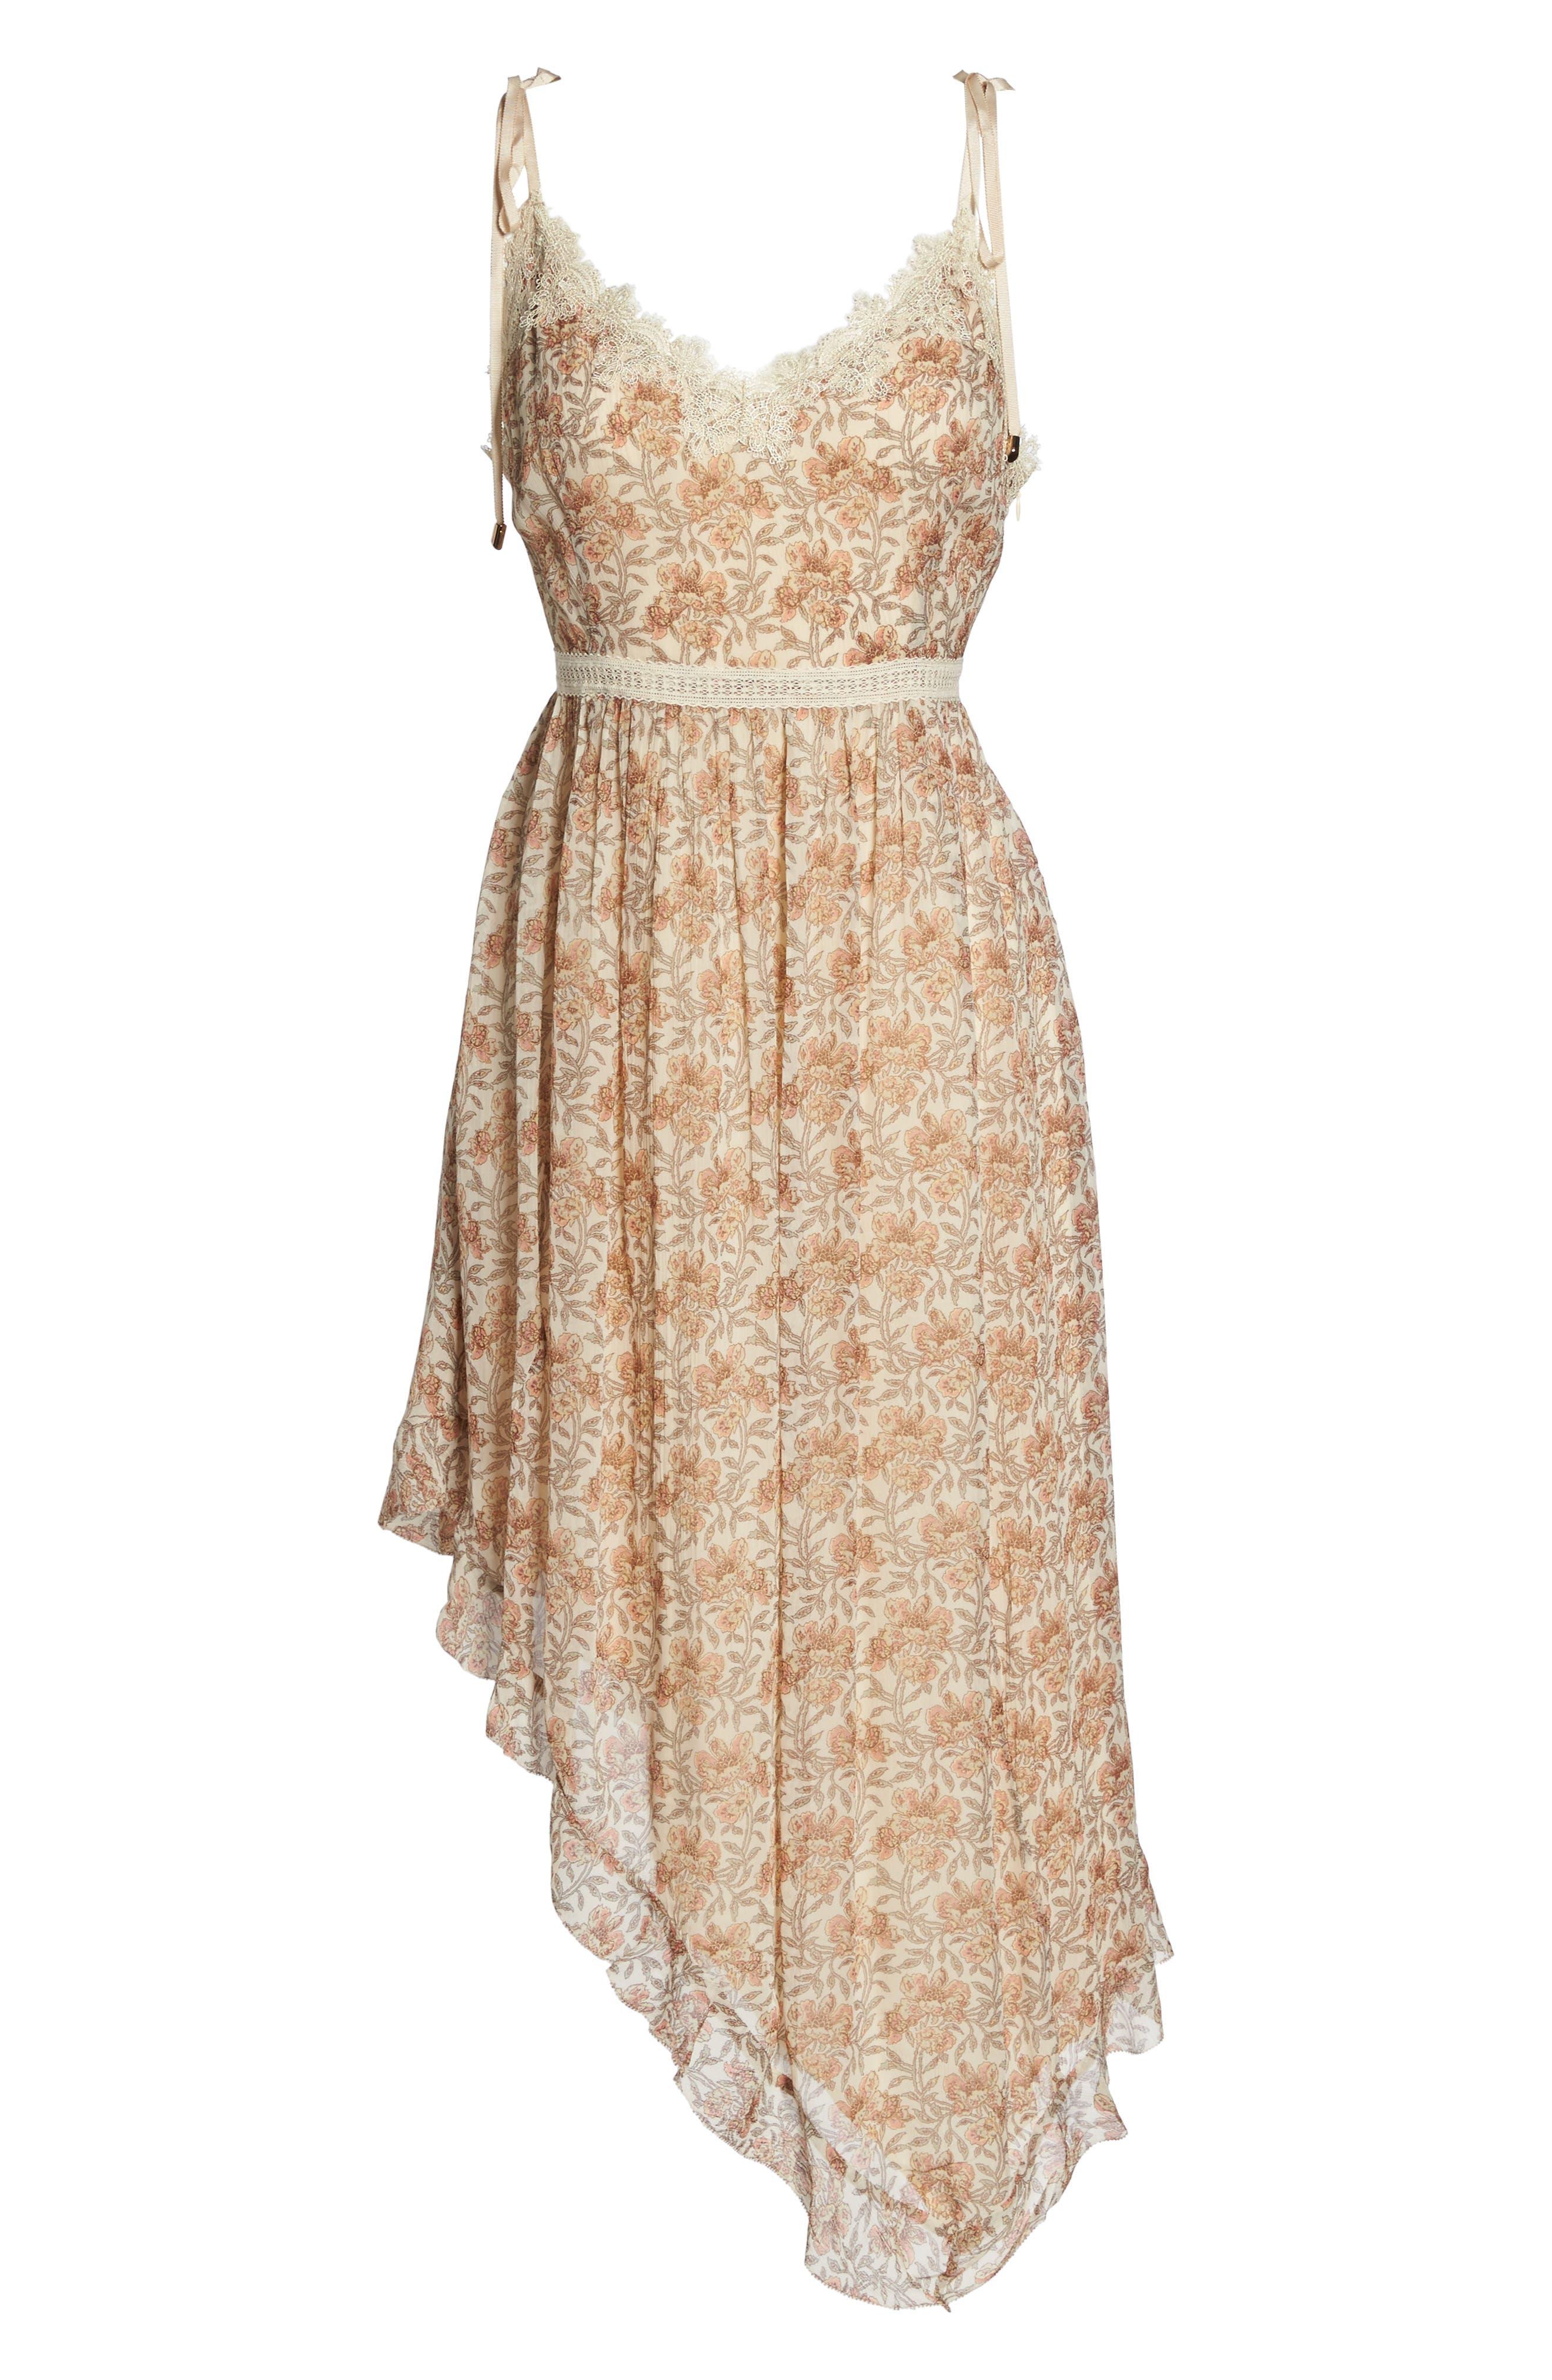 Aubrey Floral Print Dress,                             Alternate thumbnail 7, color,                             Desert Sunrise Floral